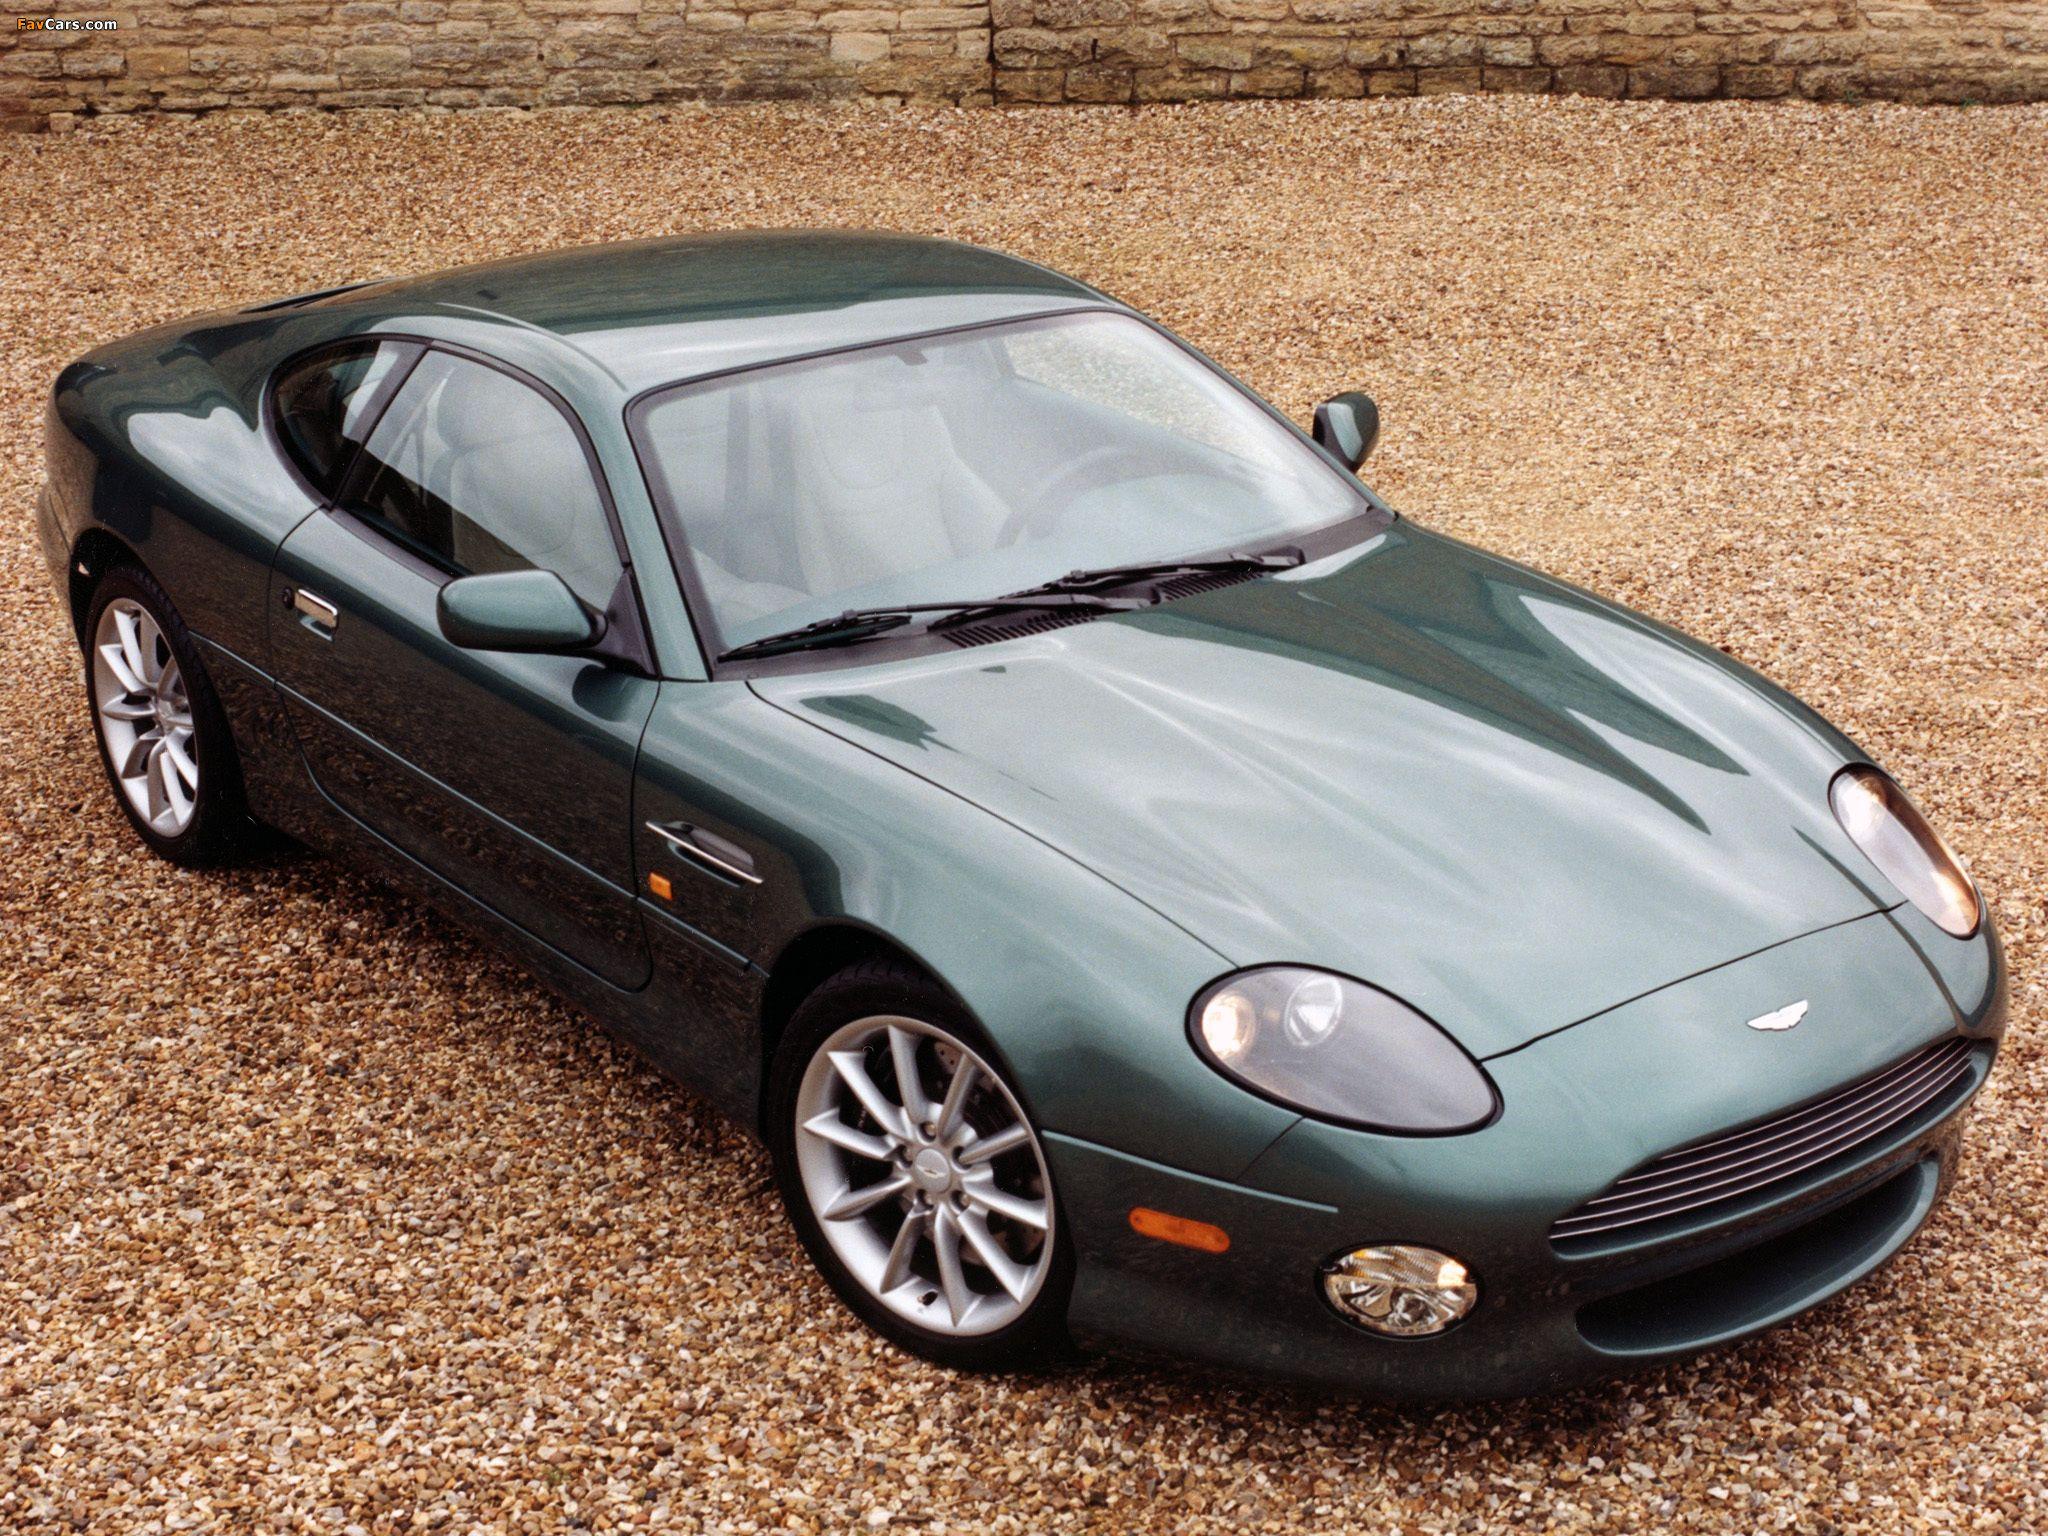 Aston Martin DB7 Vantage Interior